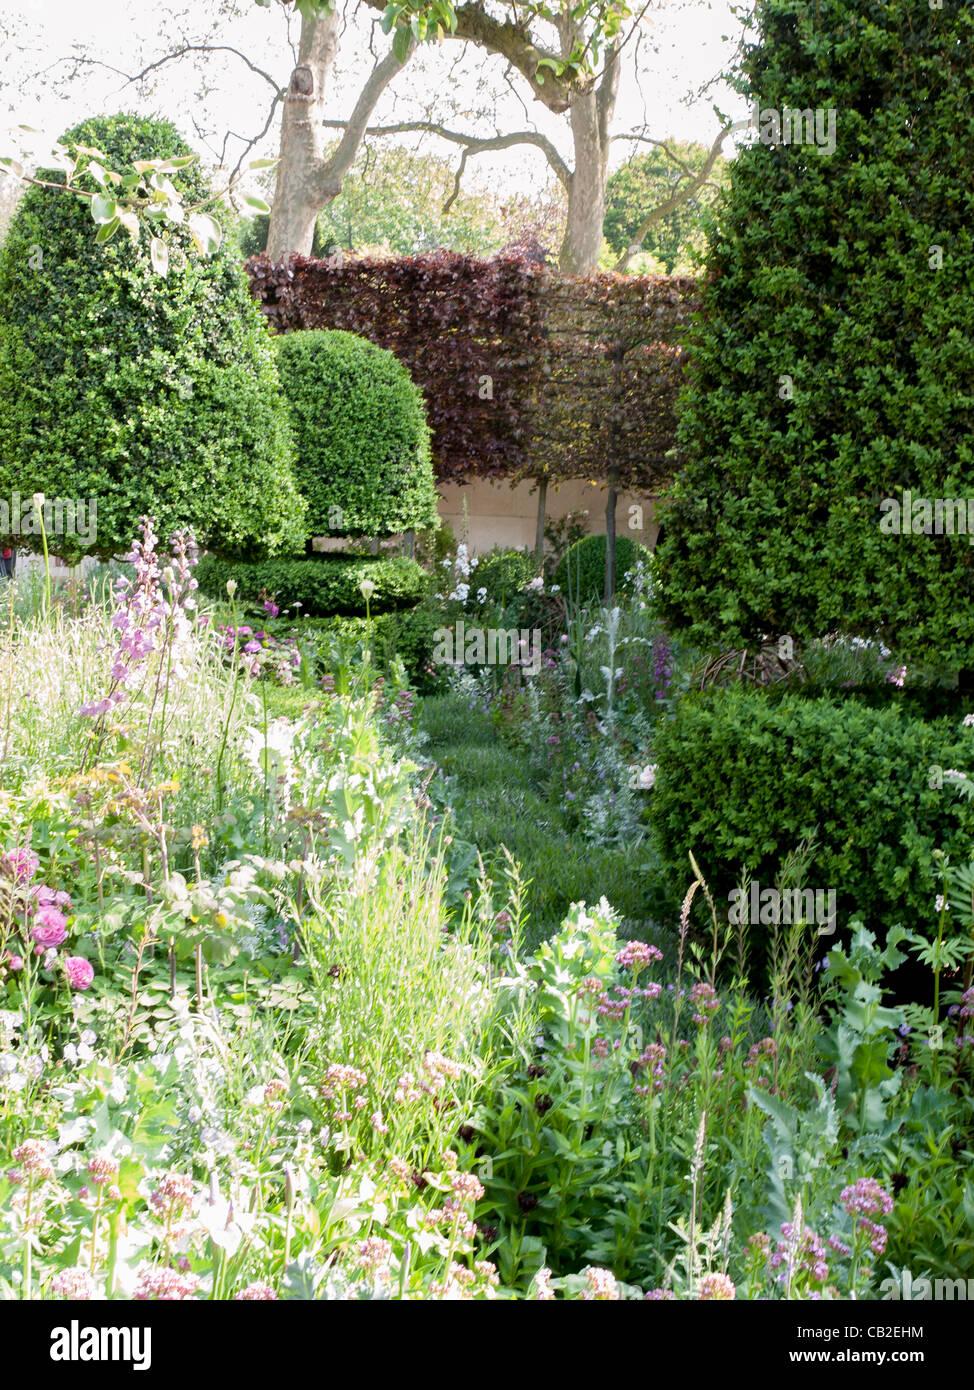 The Laurent Perrier Bicentenary Show Garden Designed By Arne